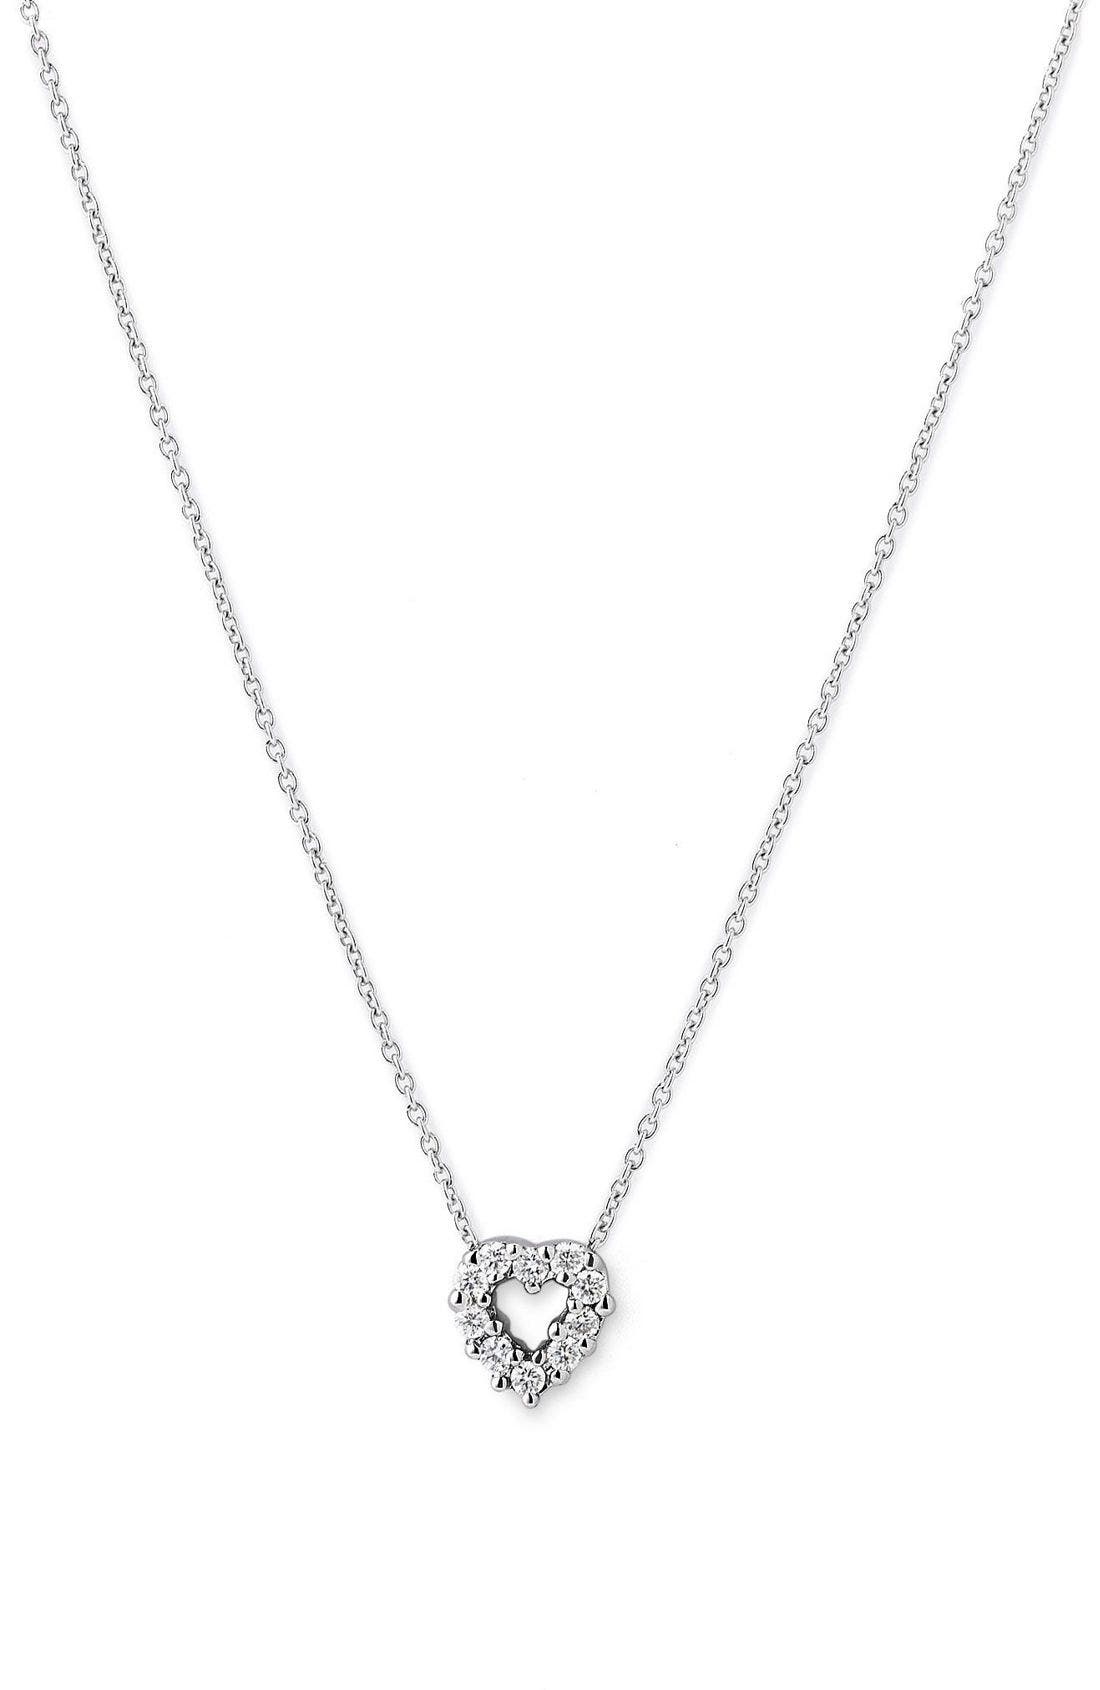 Alternate Image 1 Selected - Roberto Coin 'Tiny Treasures' Diamond Heart Pendant Necklace